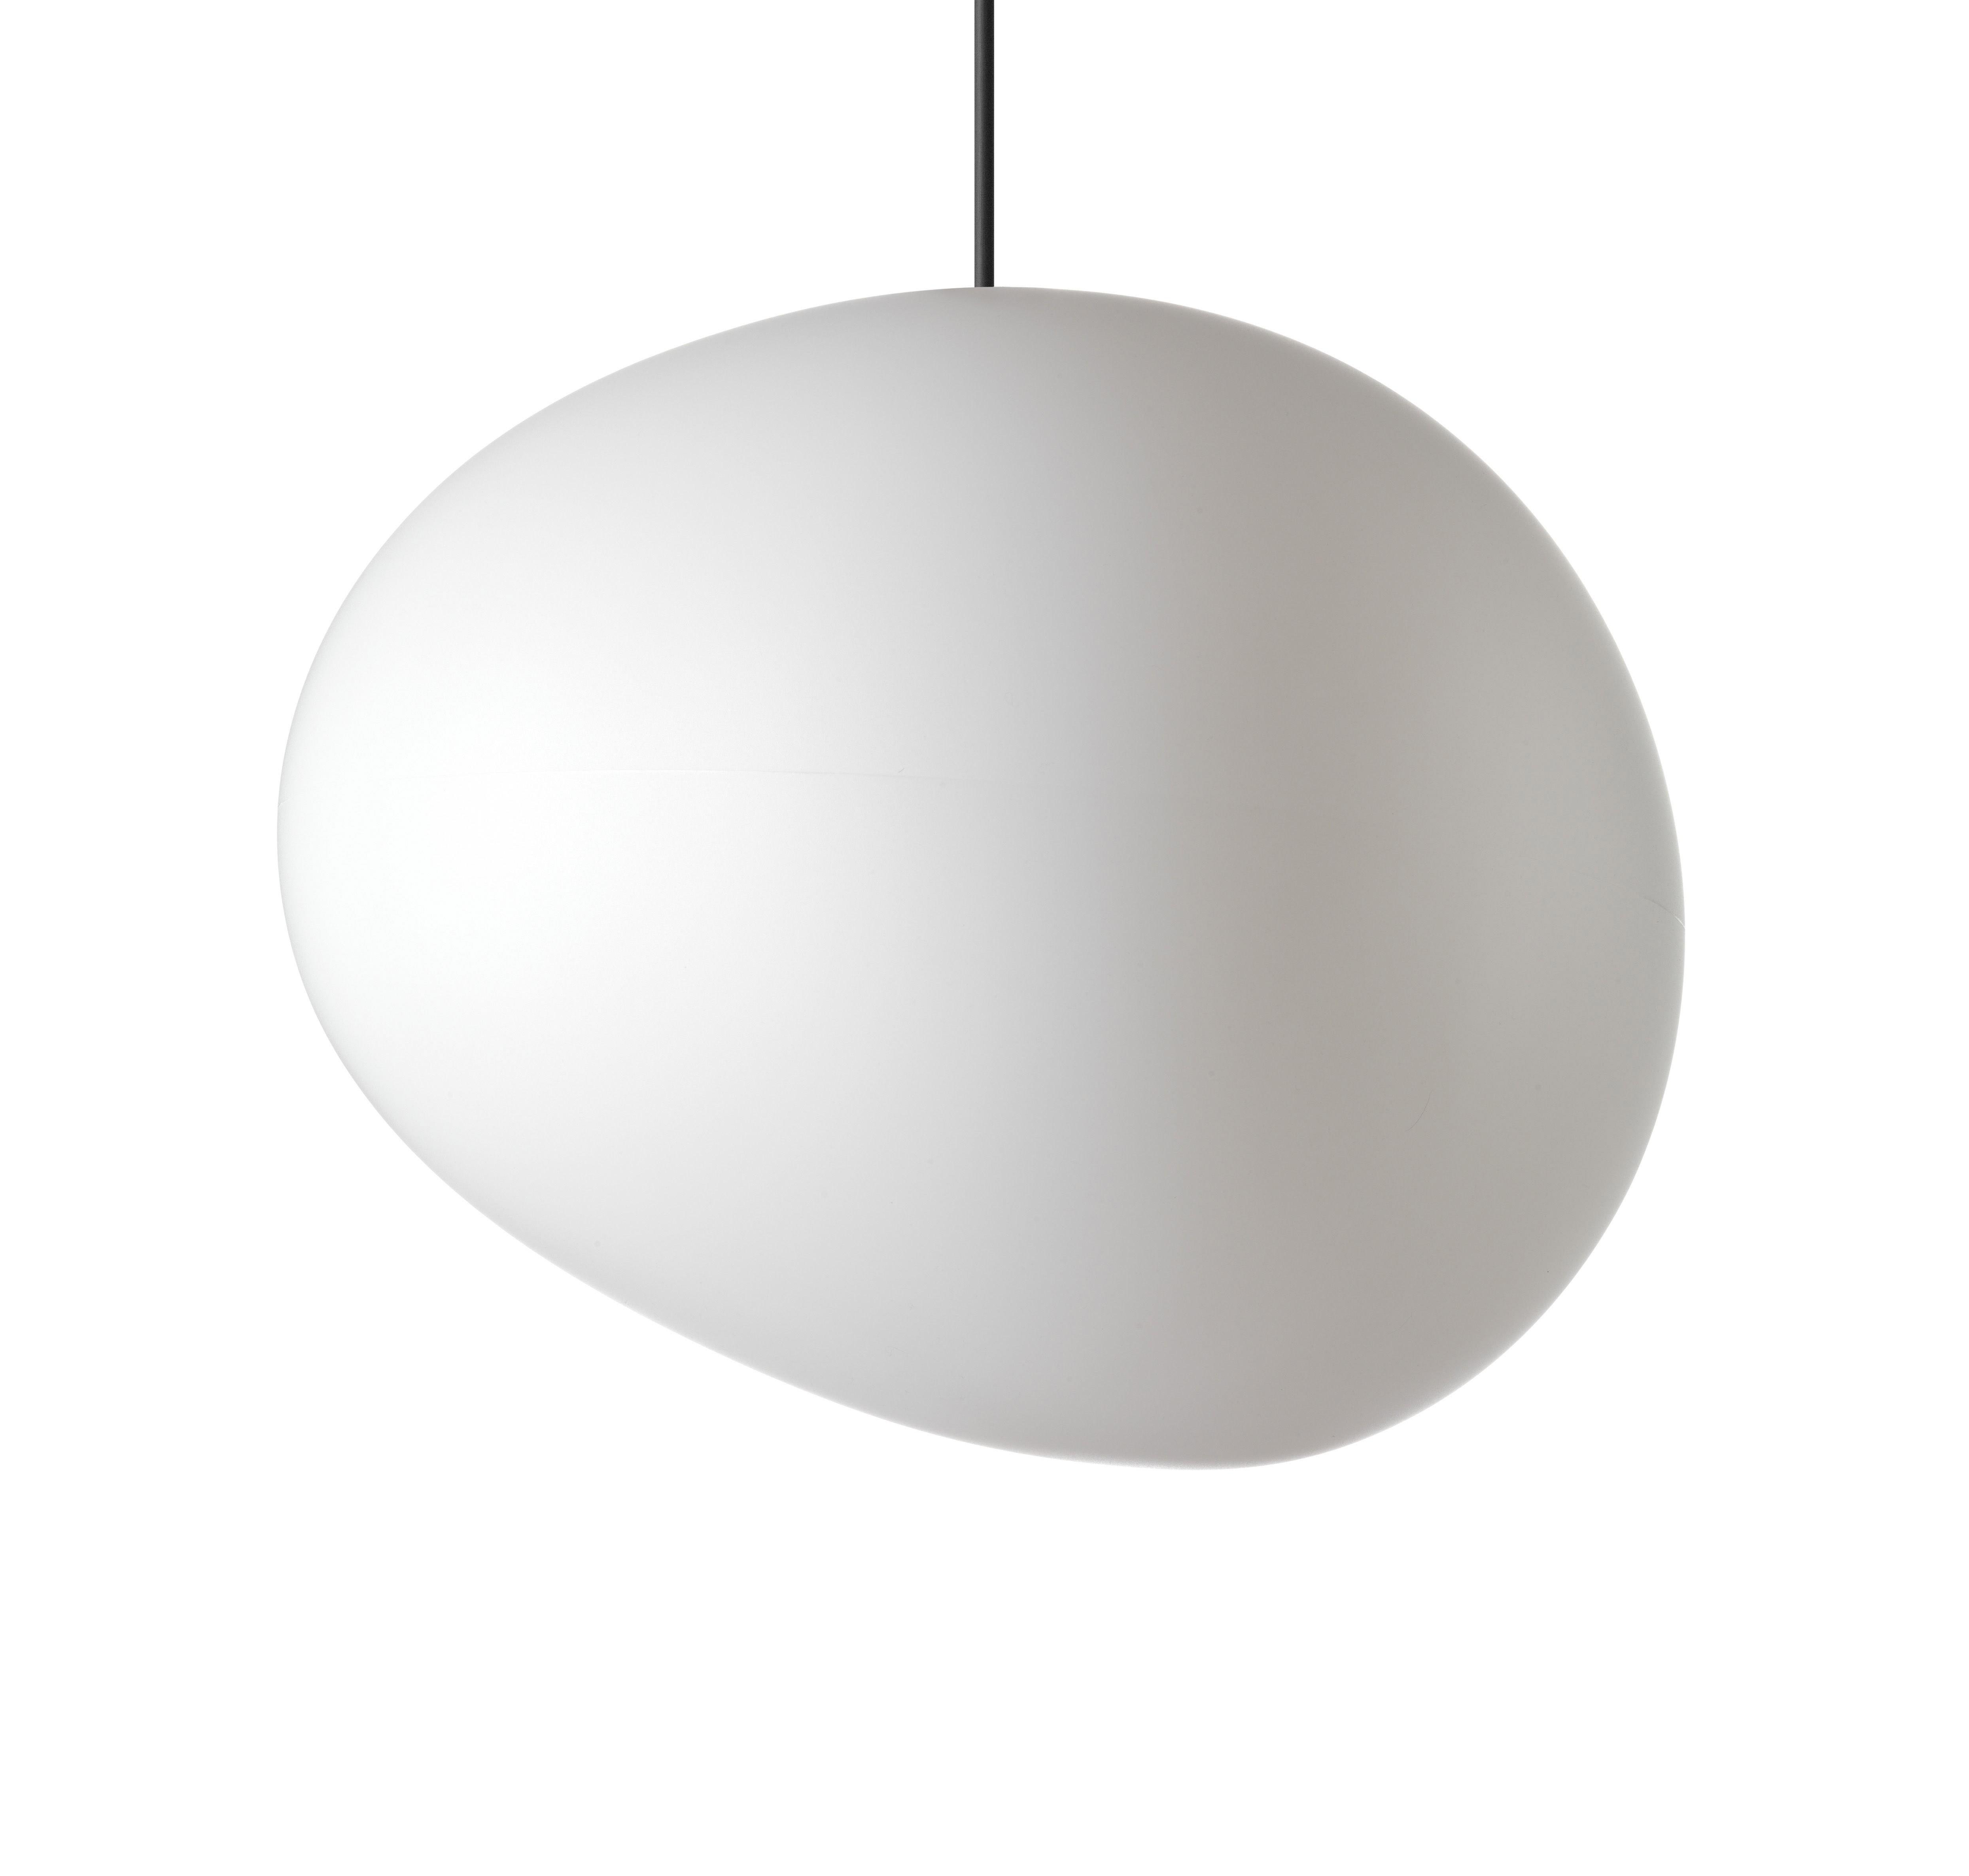 Foscarini Gregg X Large Outdoor Lamp